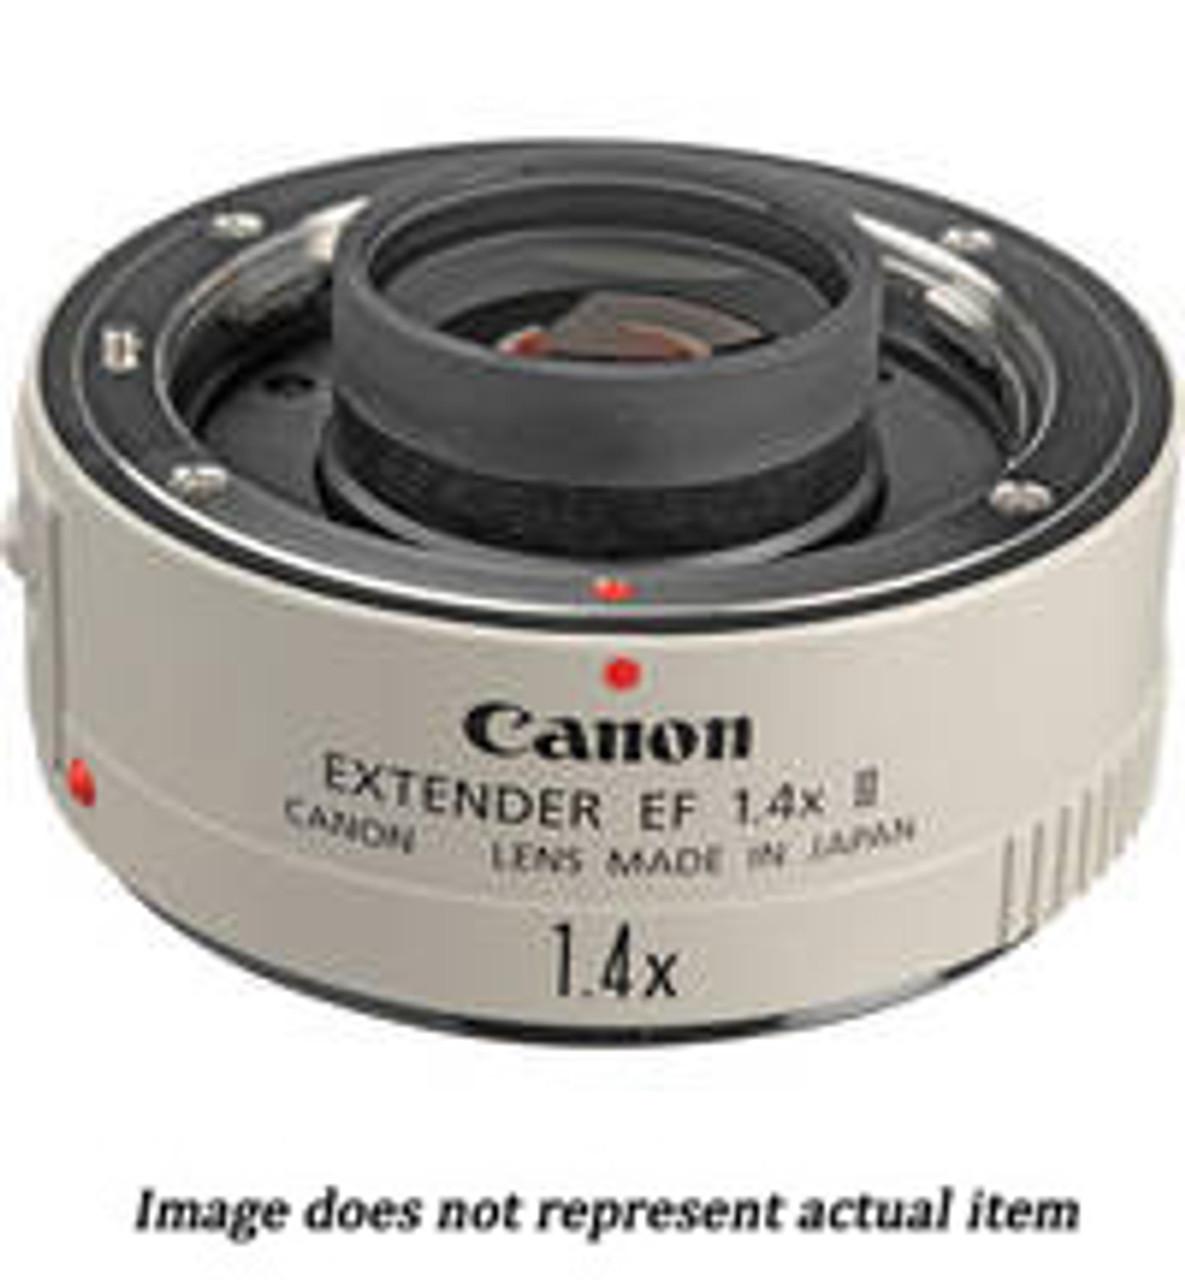 Canon EF 1.4x Extender II (Teleconverter) (USED) - S/N 31933